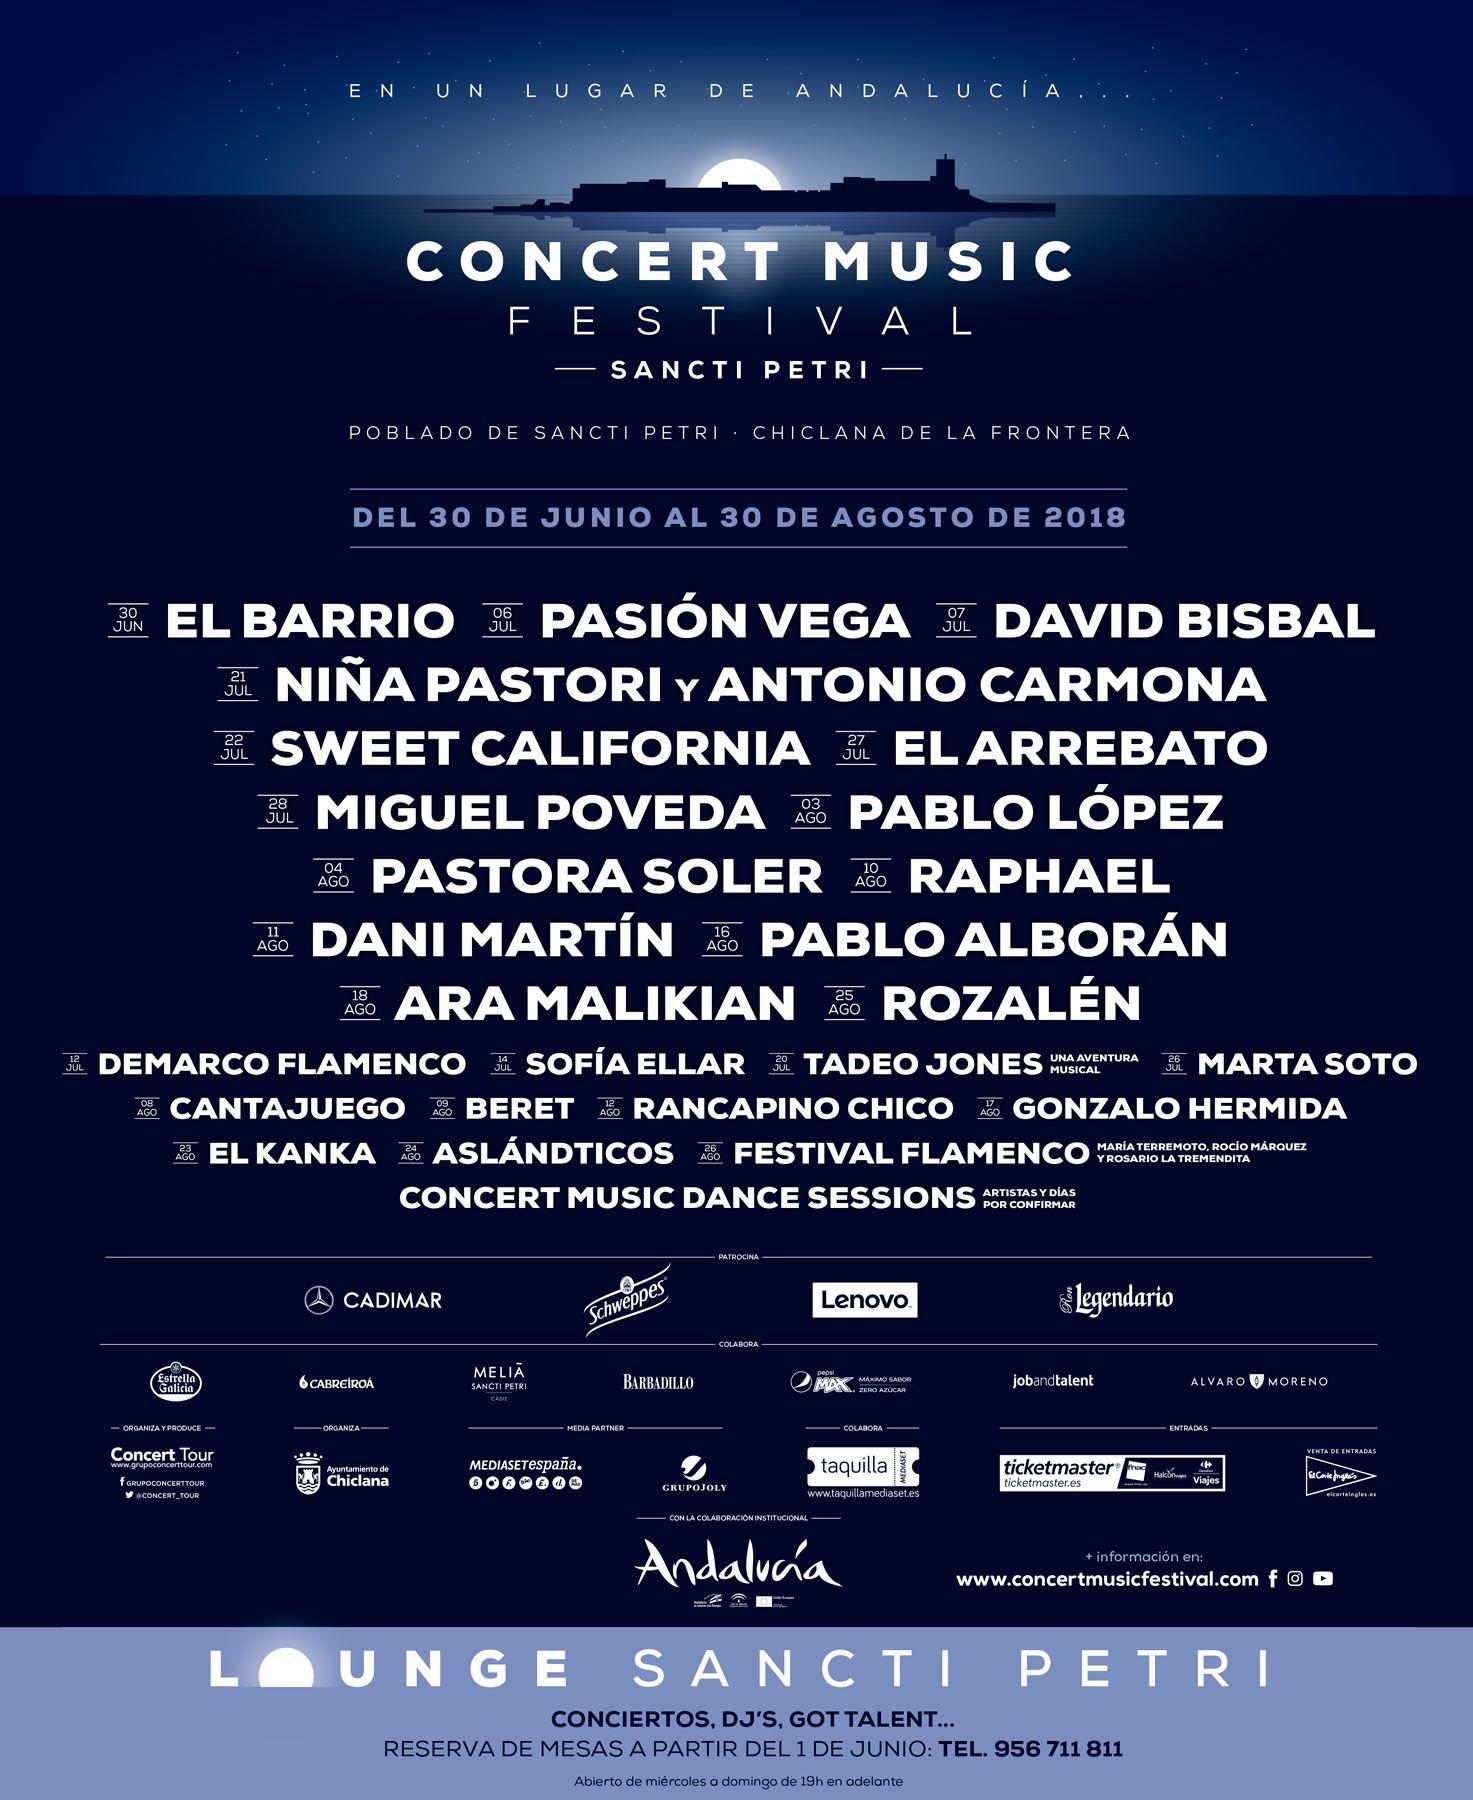 Sancti Petri musica verano